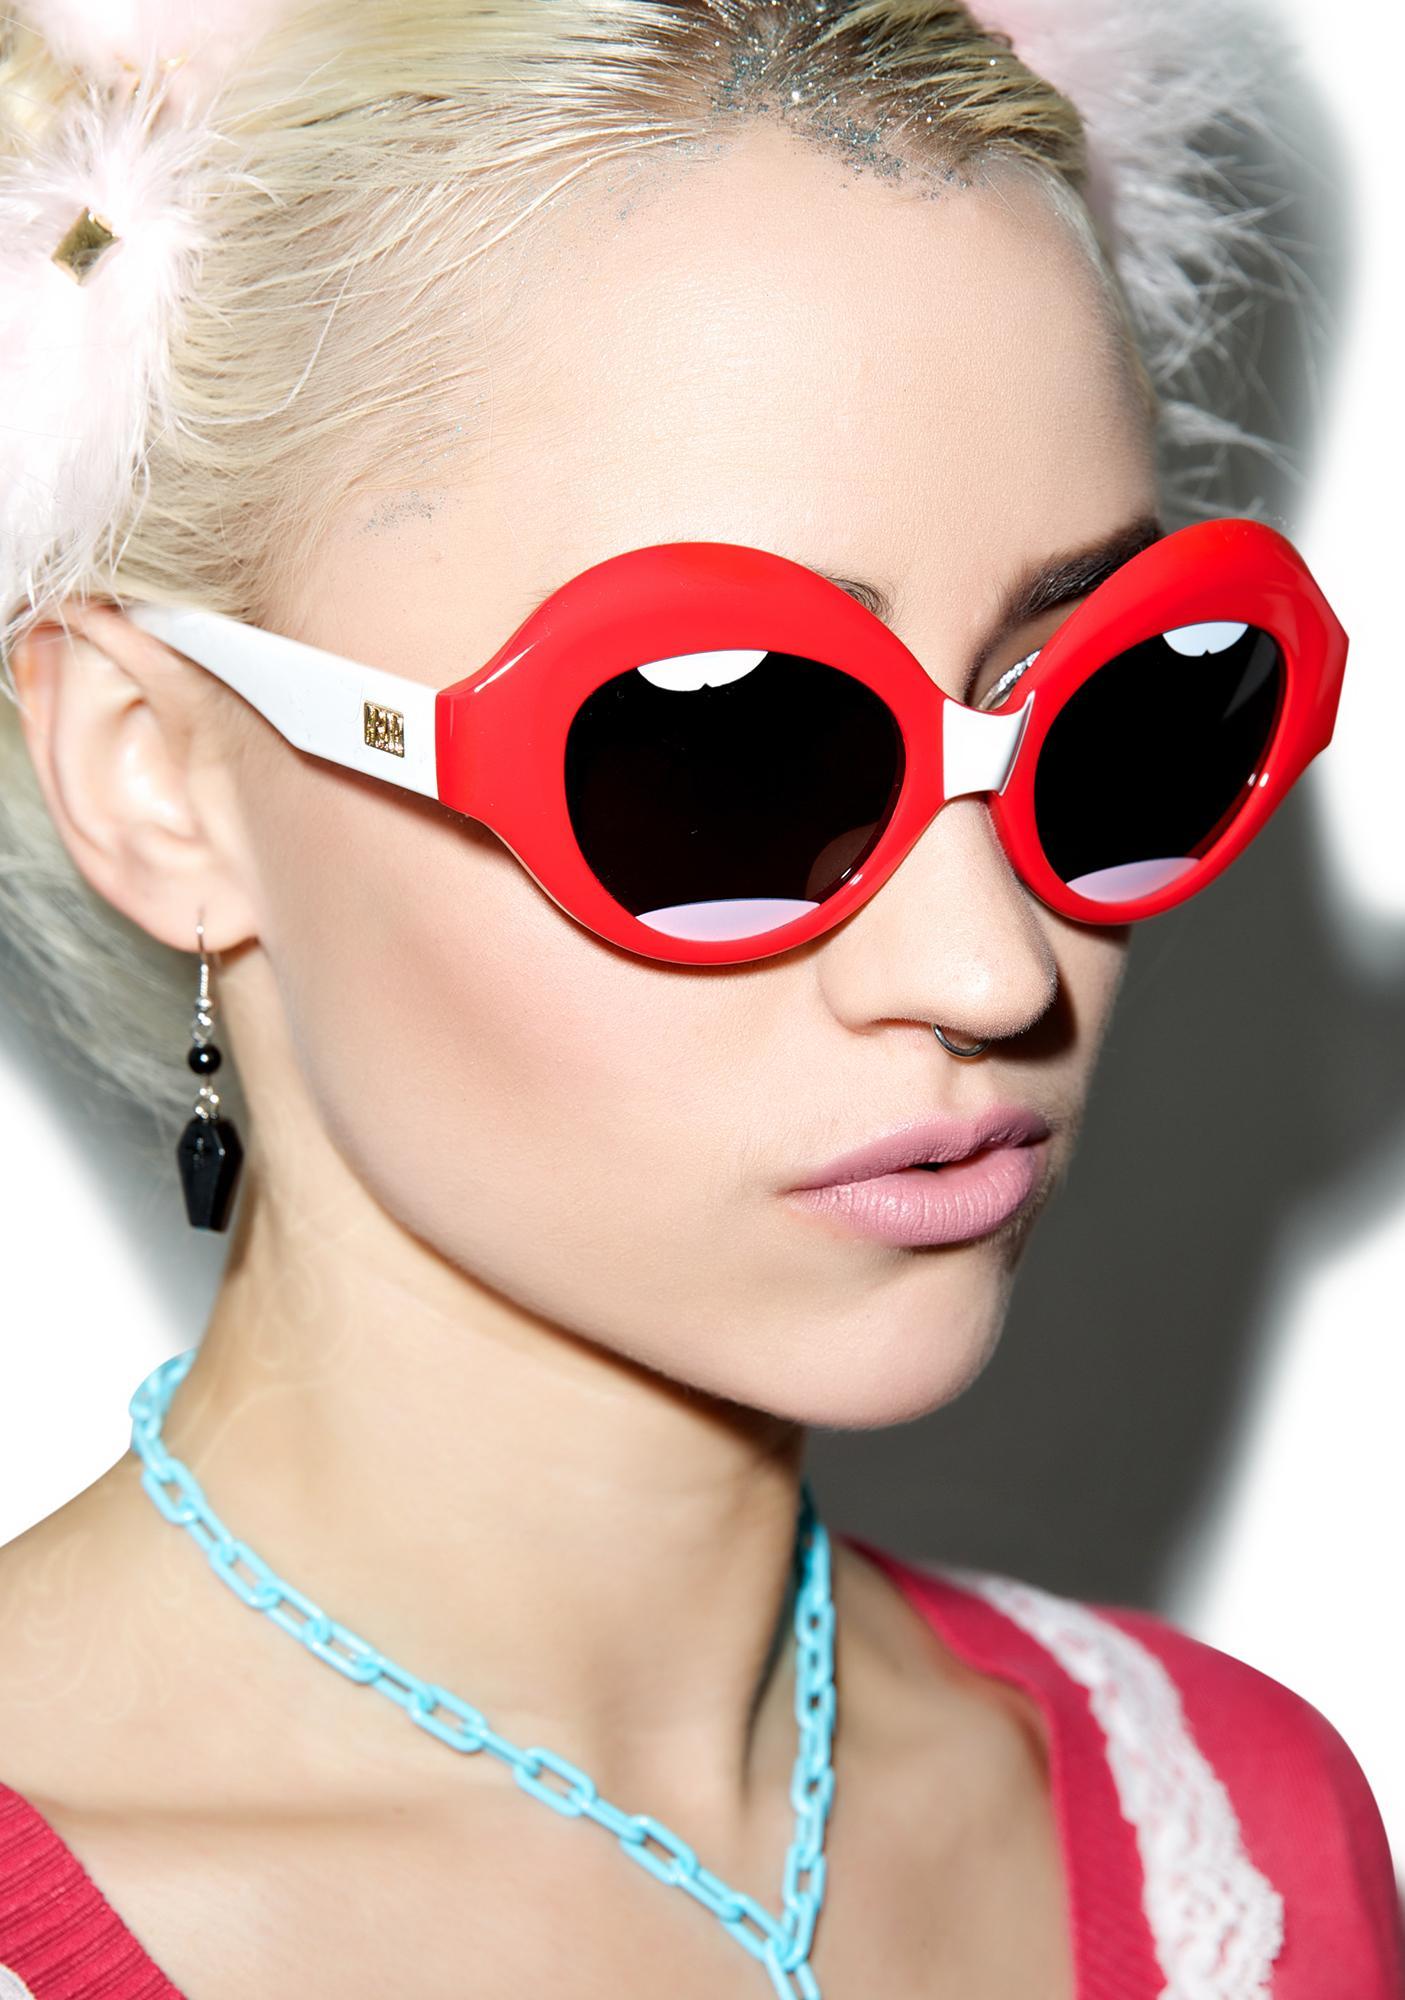 Crap Eyewear The Lips Saloma Tropic Sunglasses